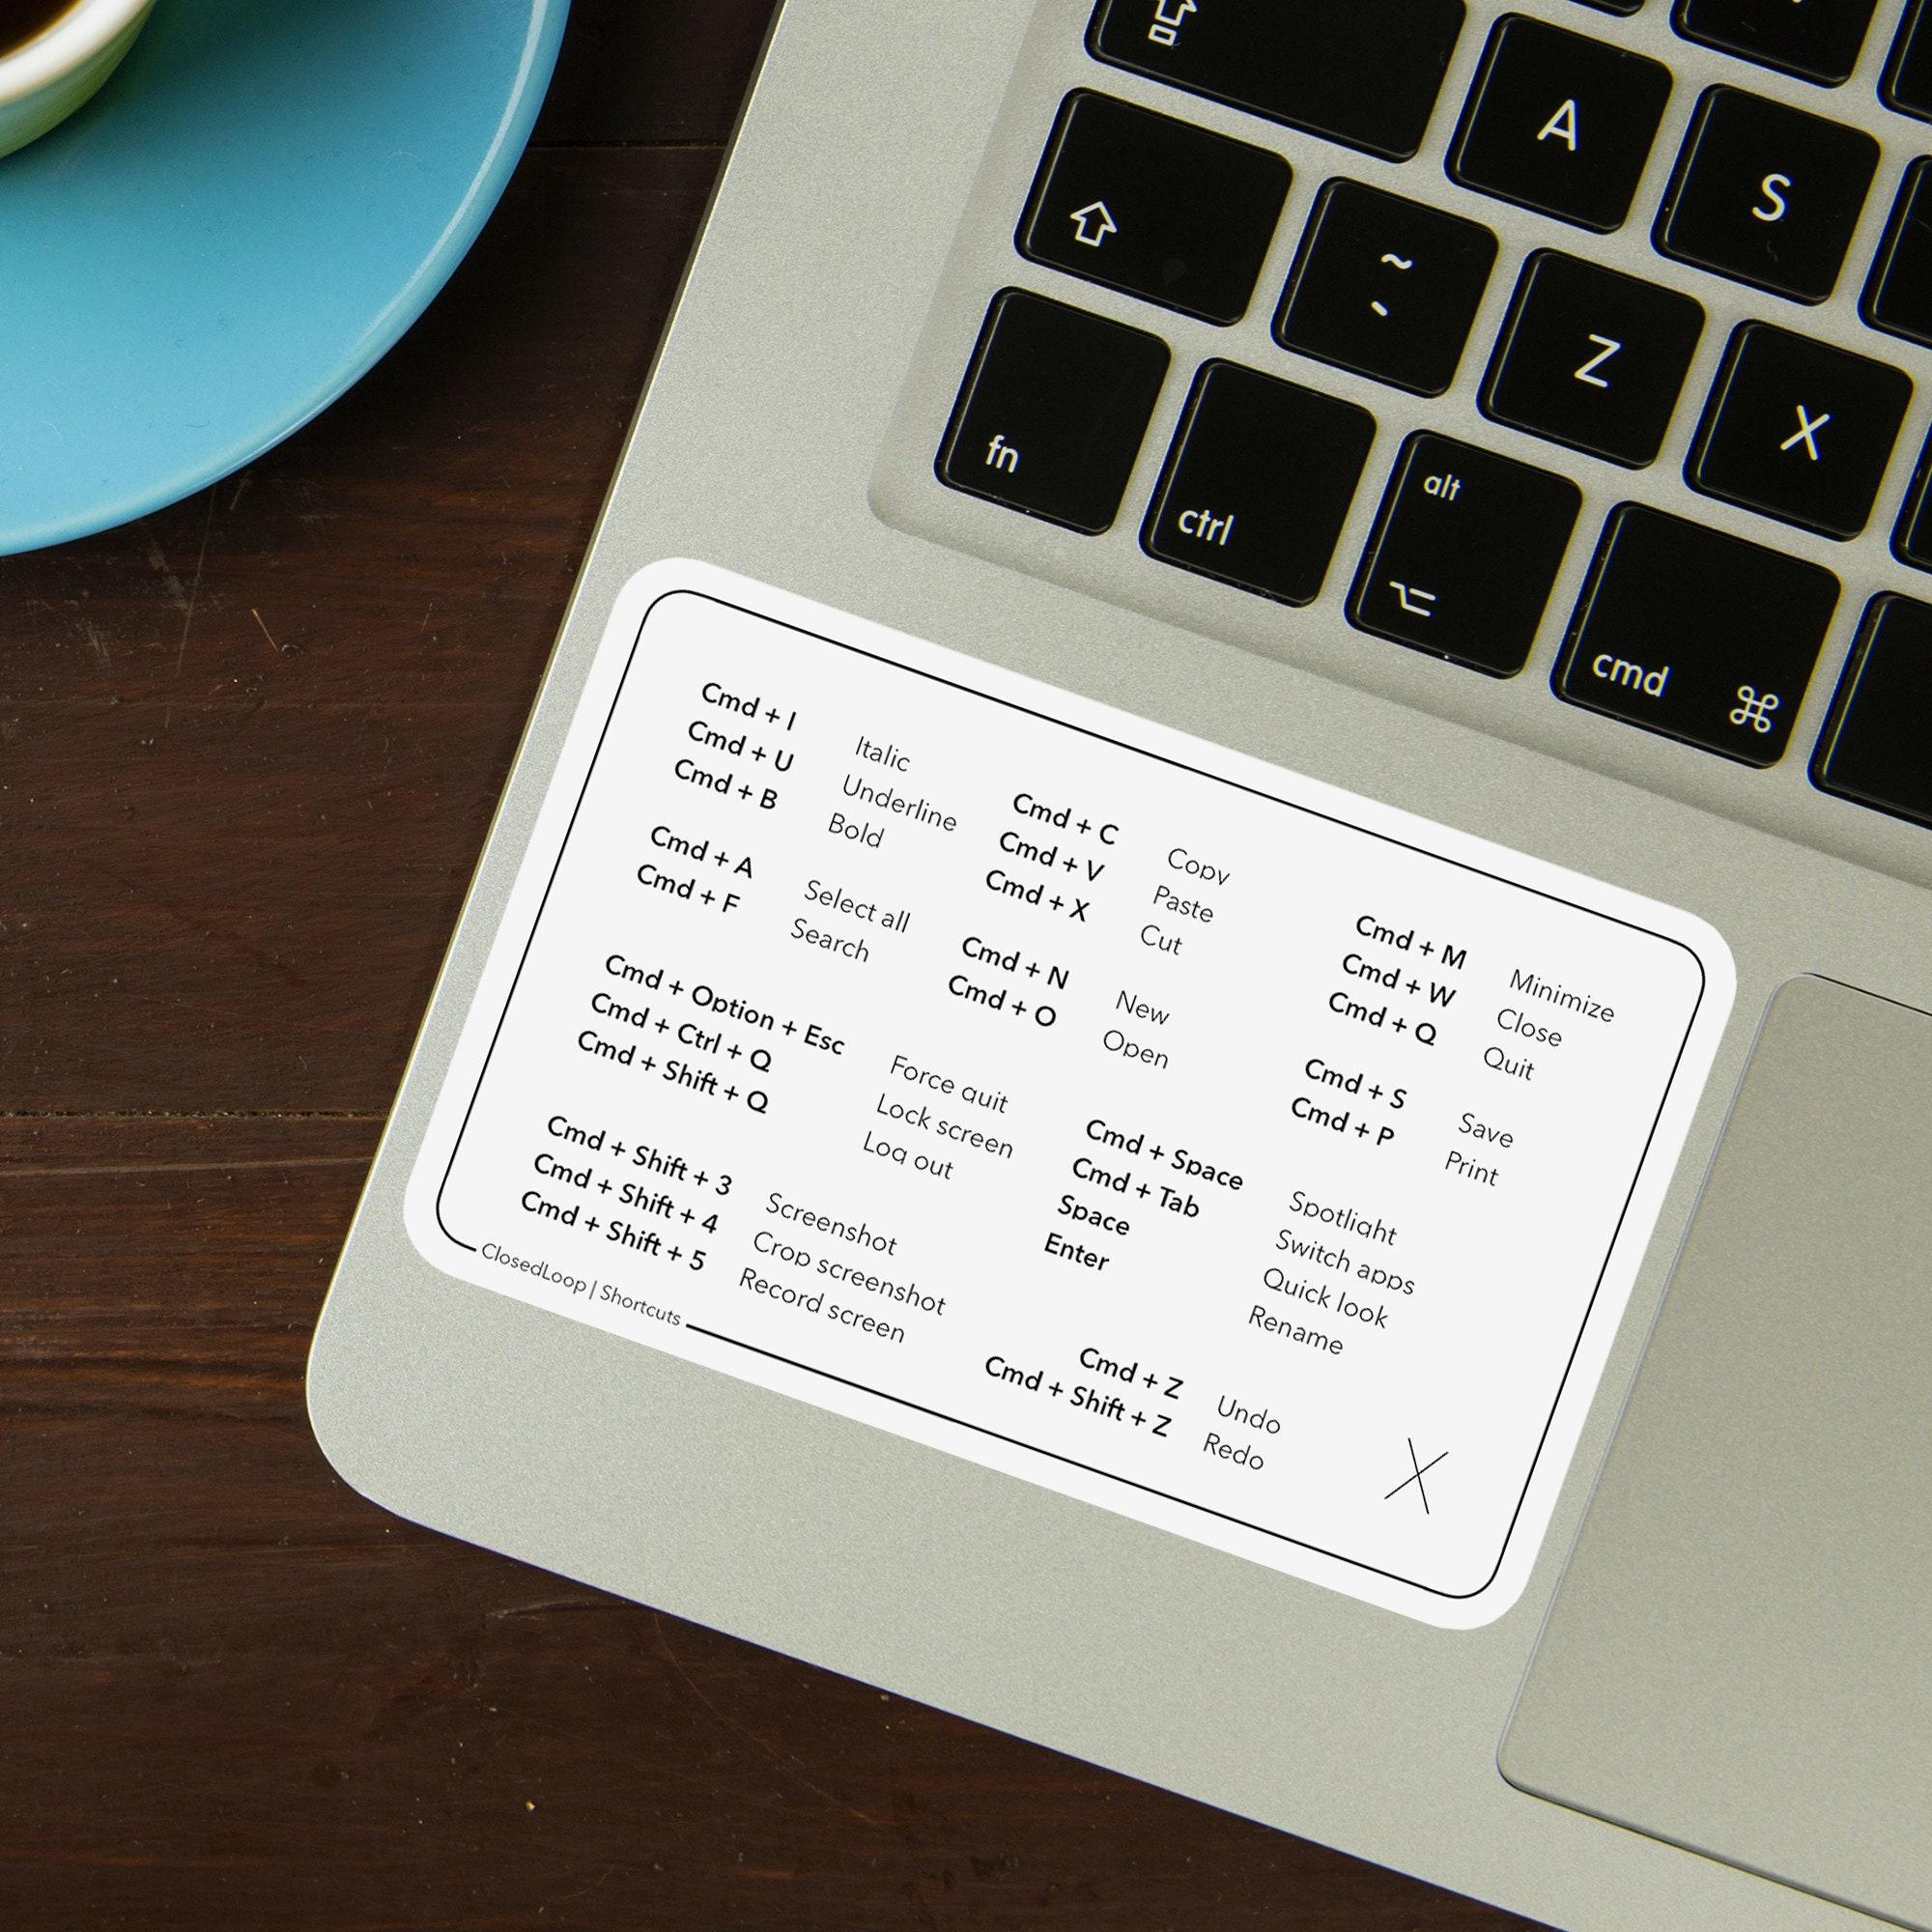 Mac OS MacBook Pro/Air/iMac Keyboard Shortcut Decal ...